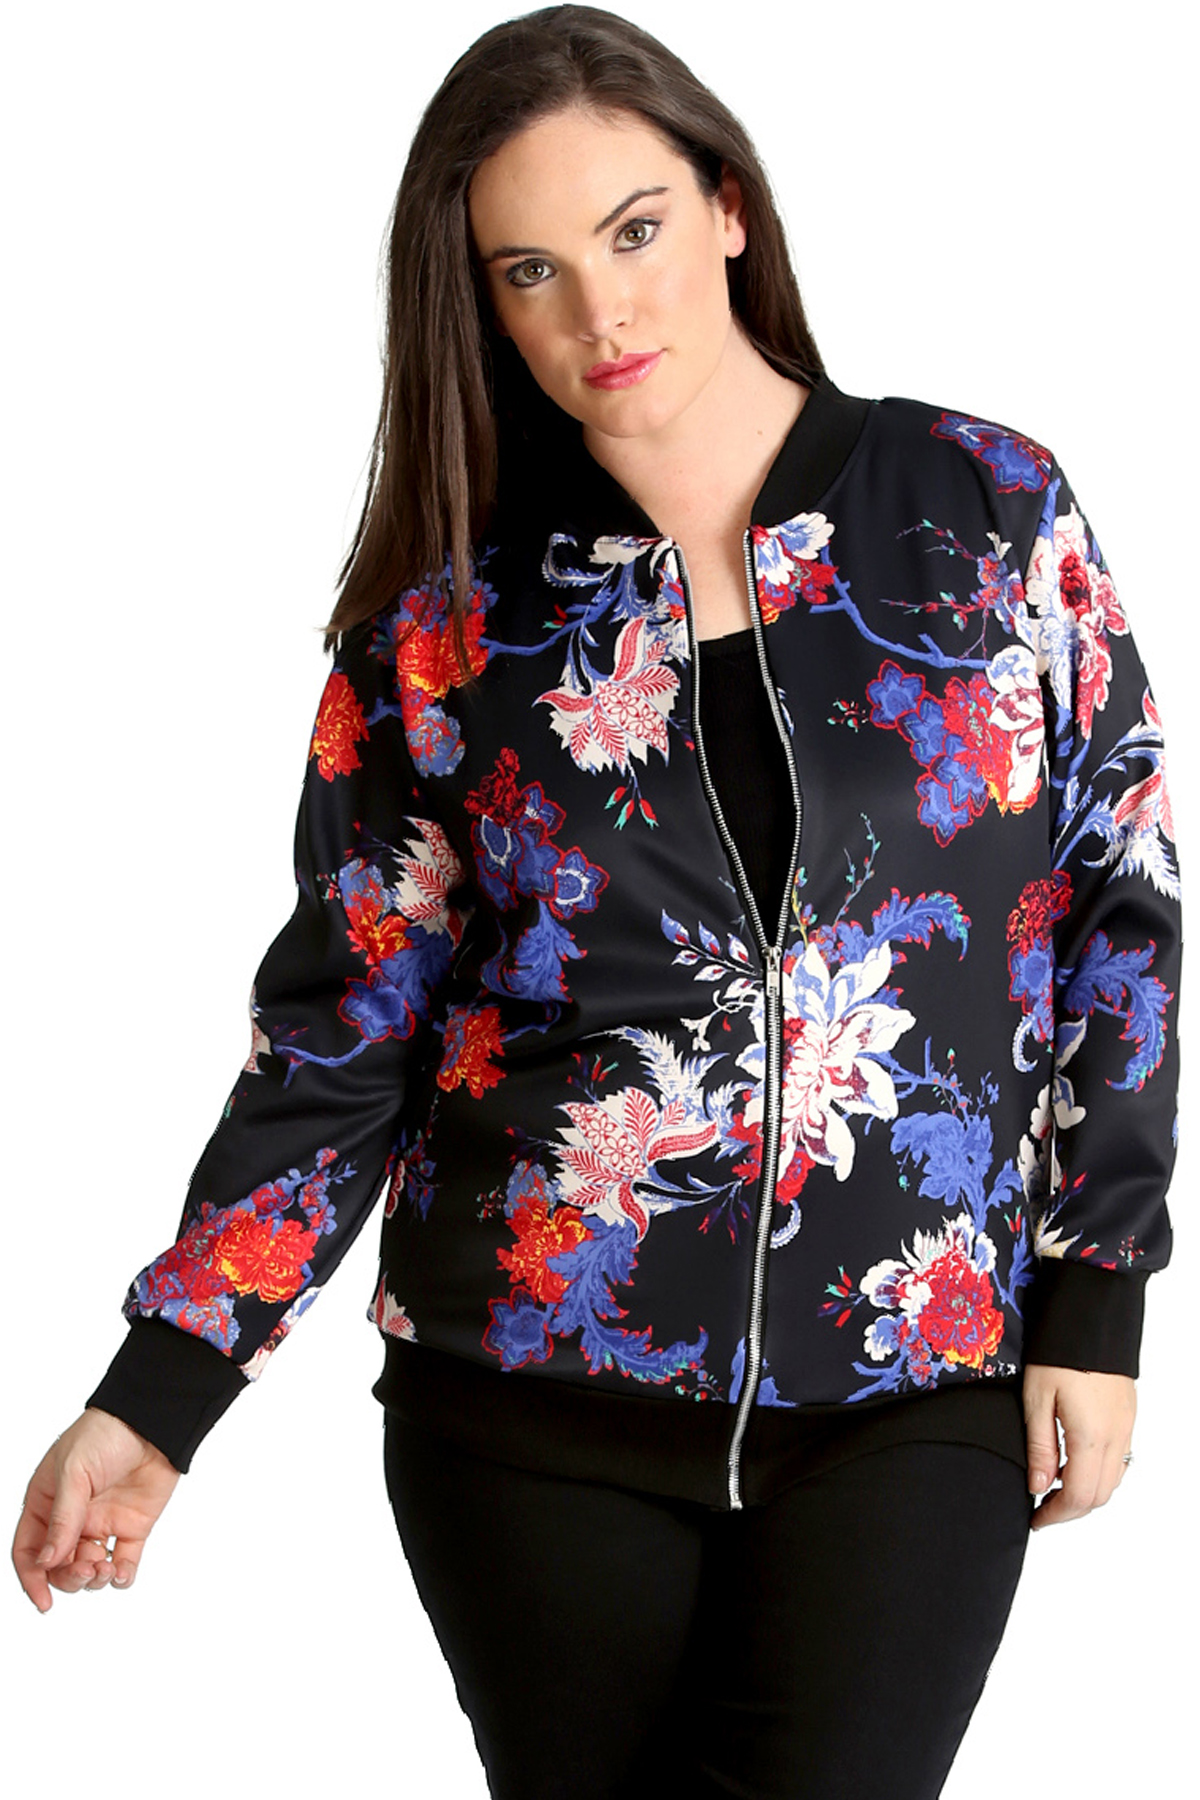 New Womens Plus Size Bomber Jacket Ladies Floral Print Rib Jungle Sale Quality